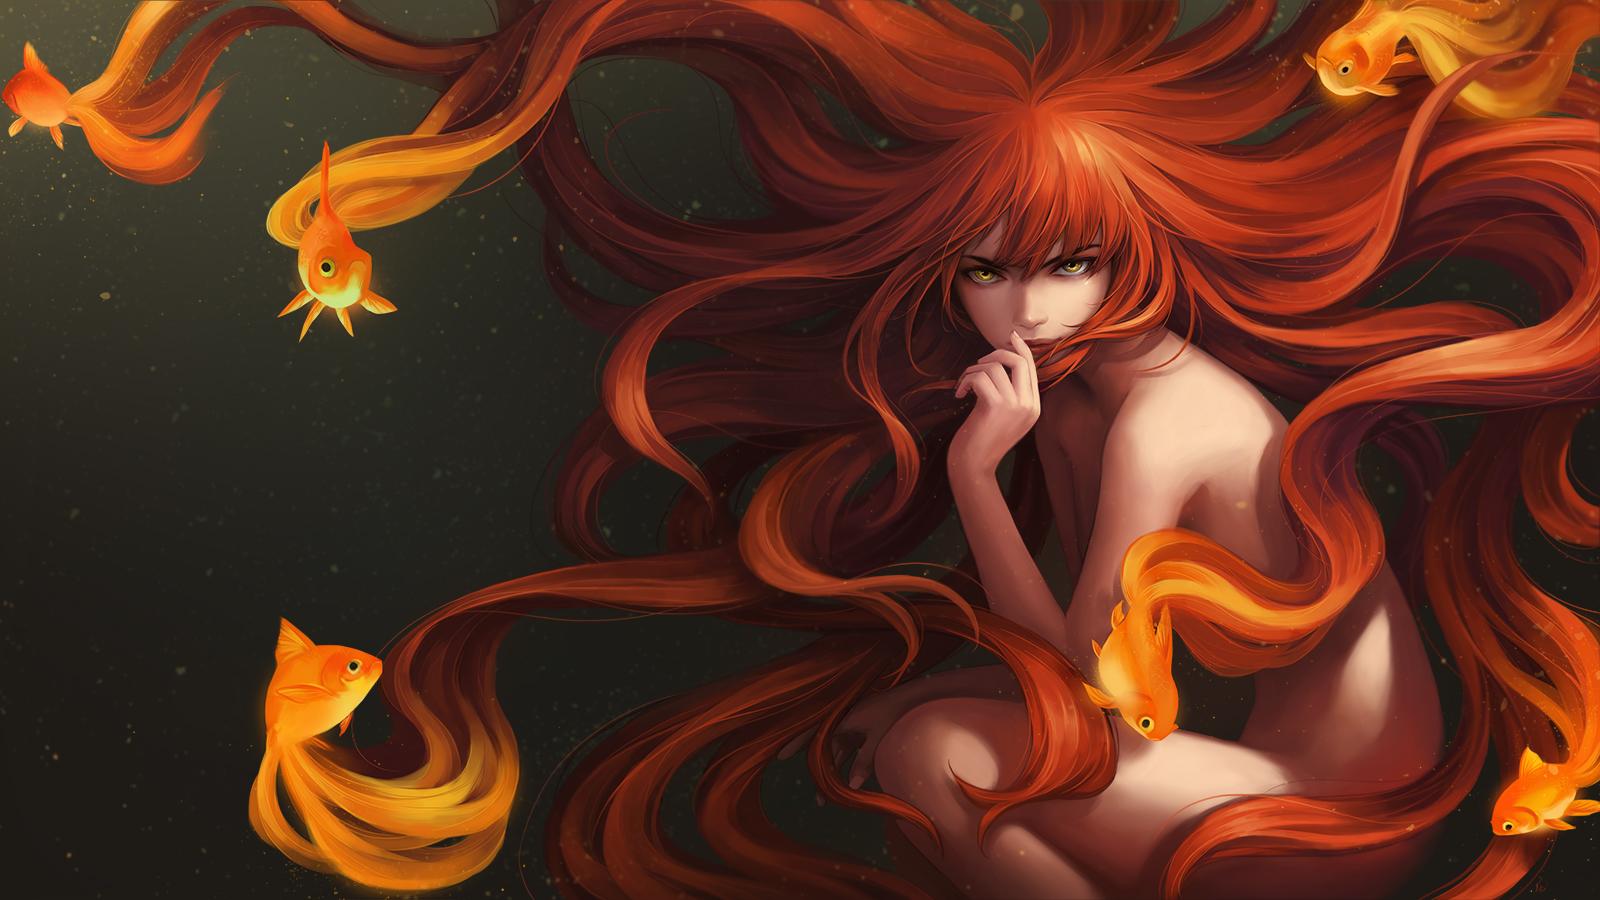 Goldfish_Girl by Unodu